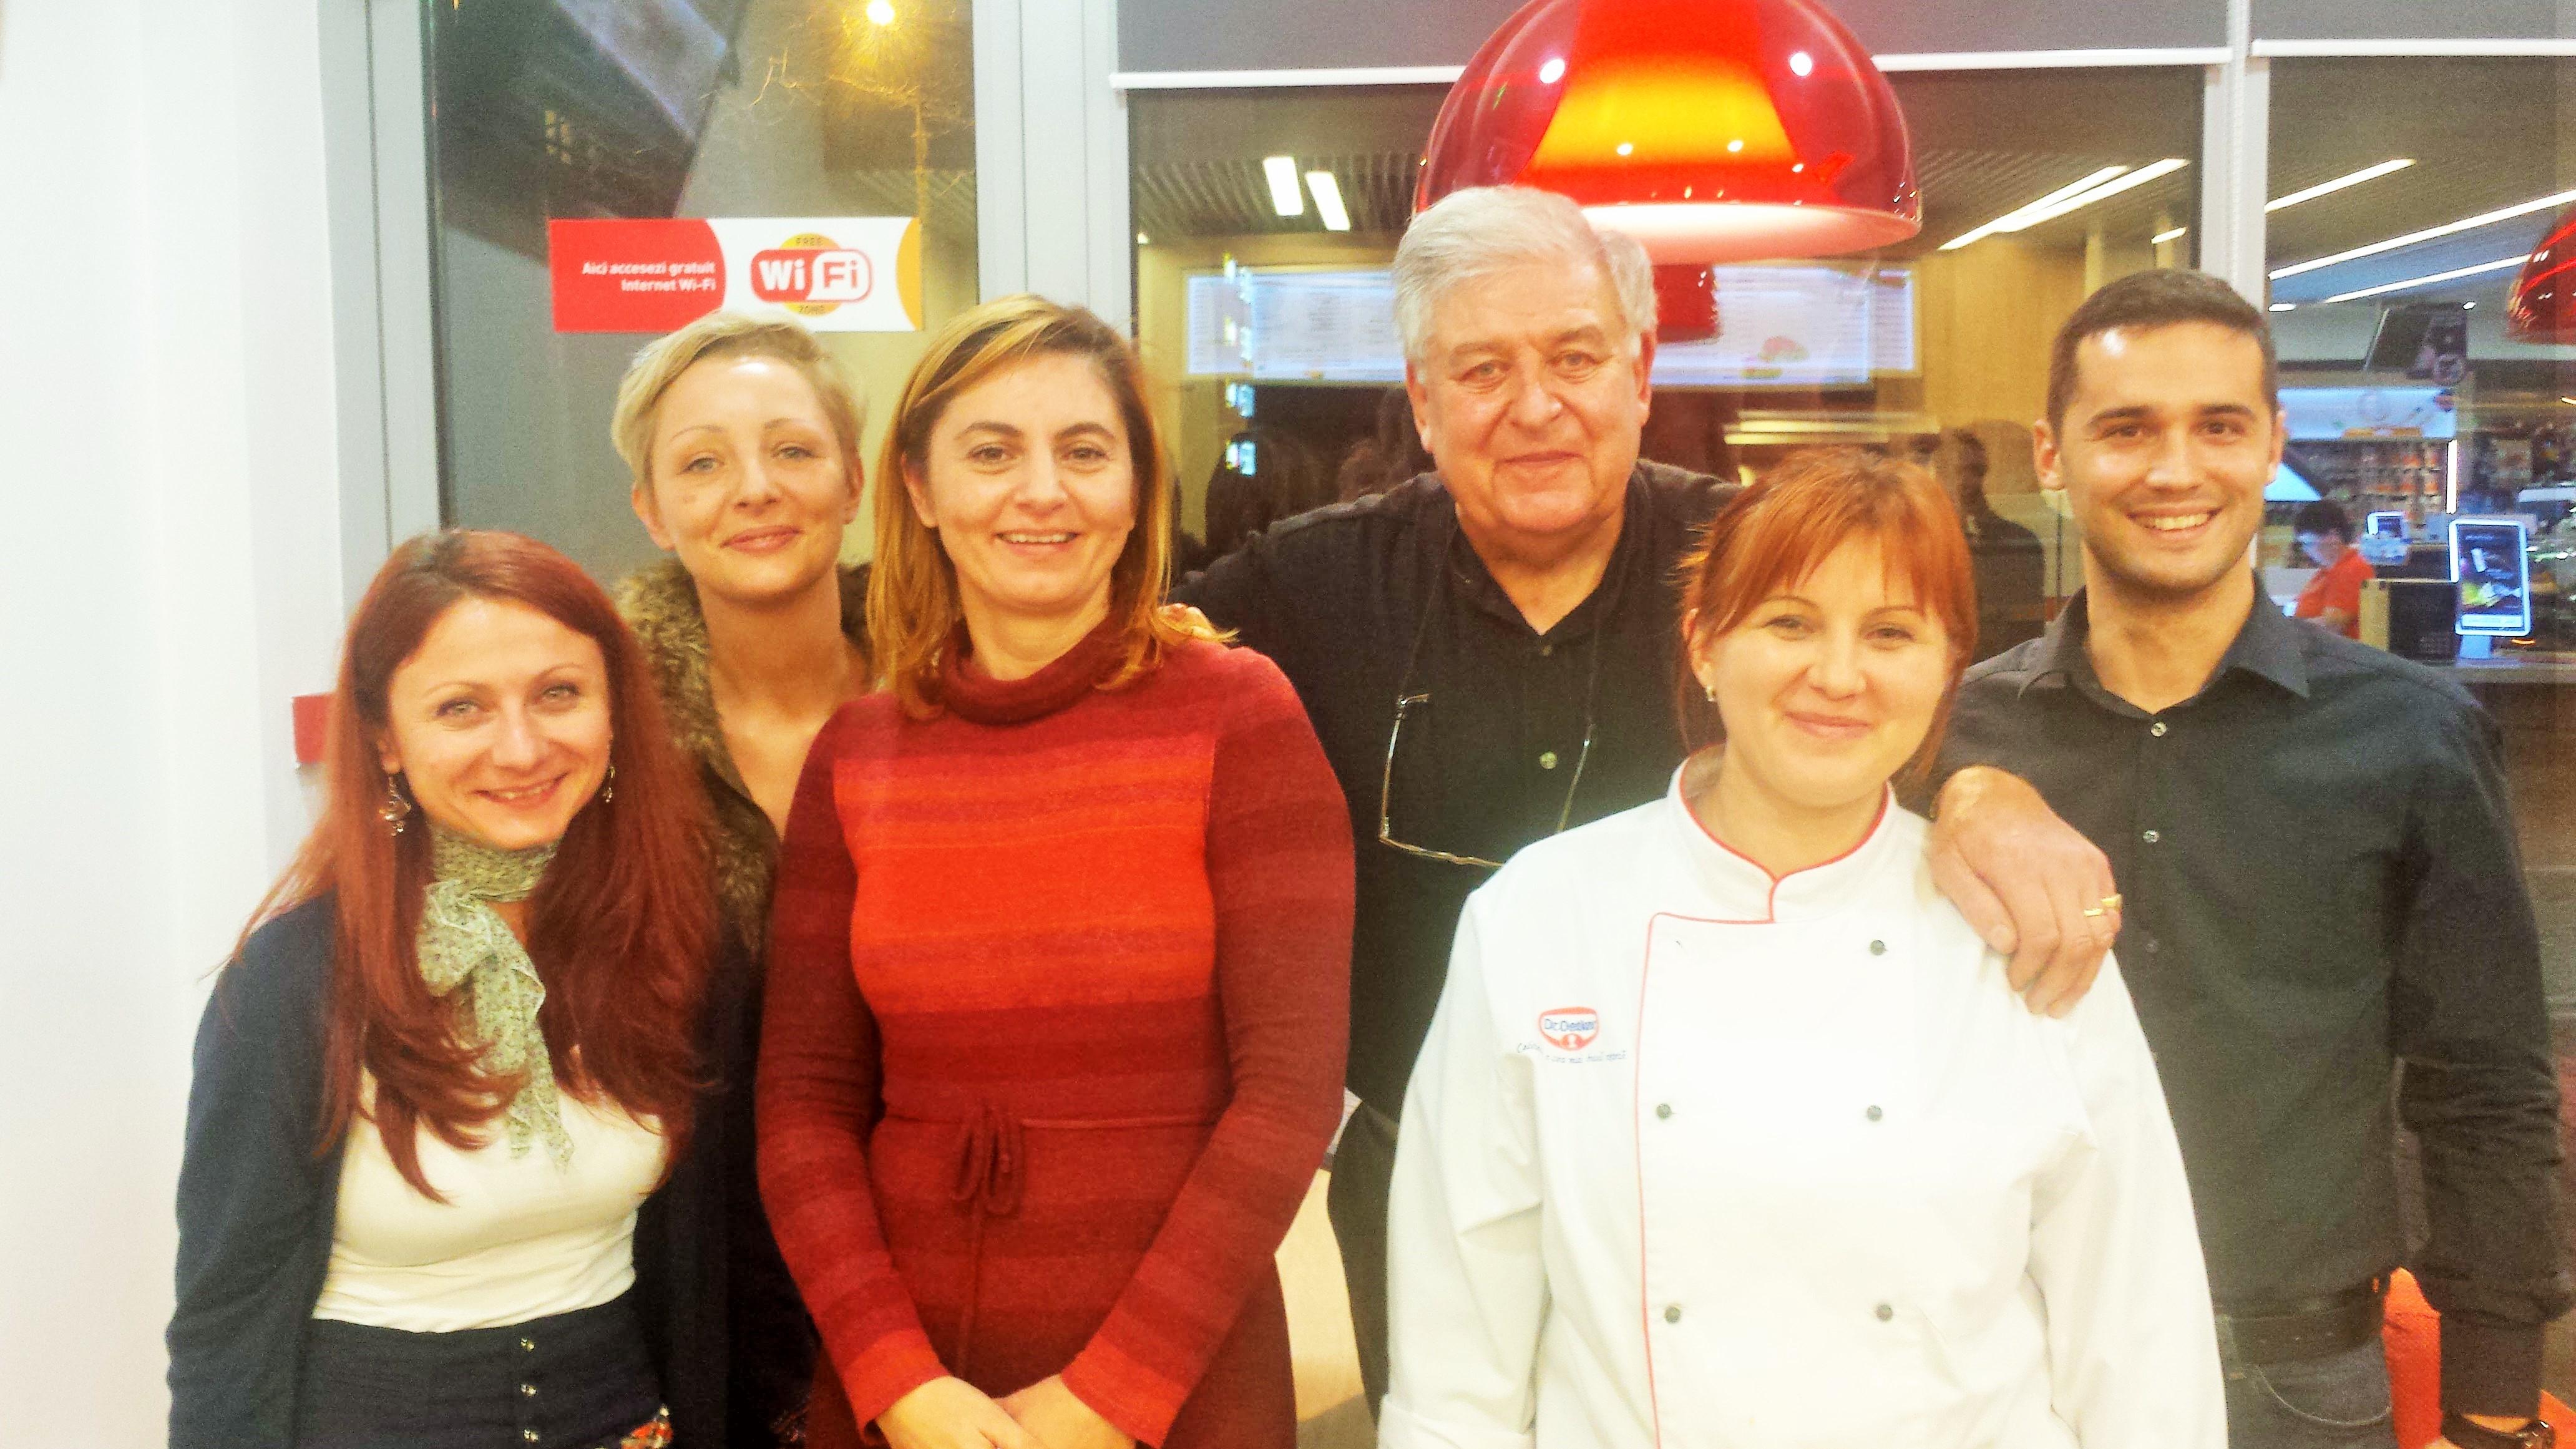 2015-Bucharest (Roumanie) L'équipe des restaurants Rompetrol